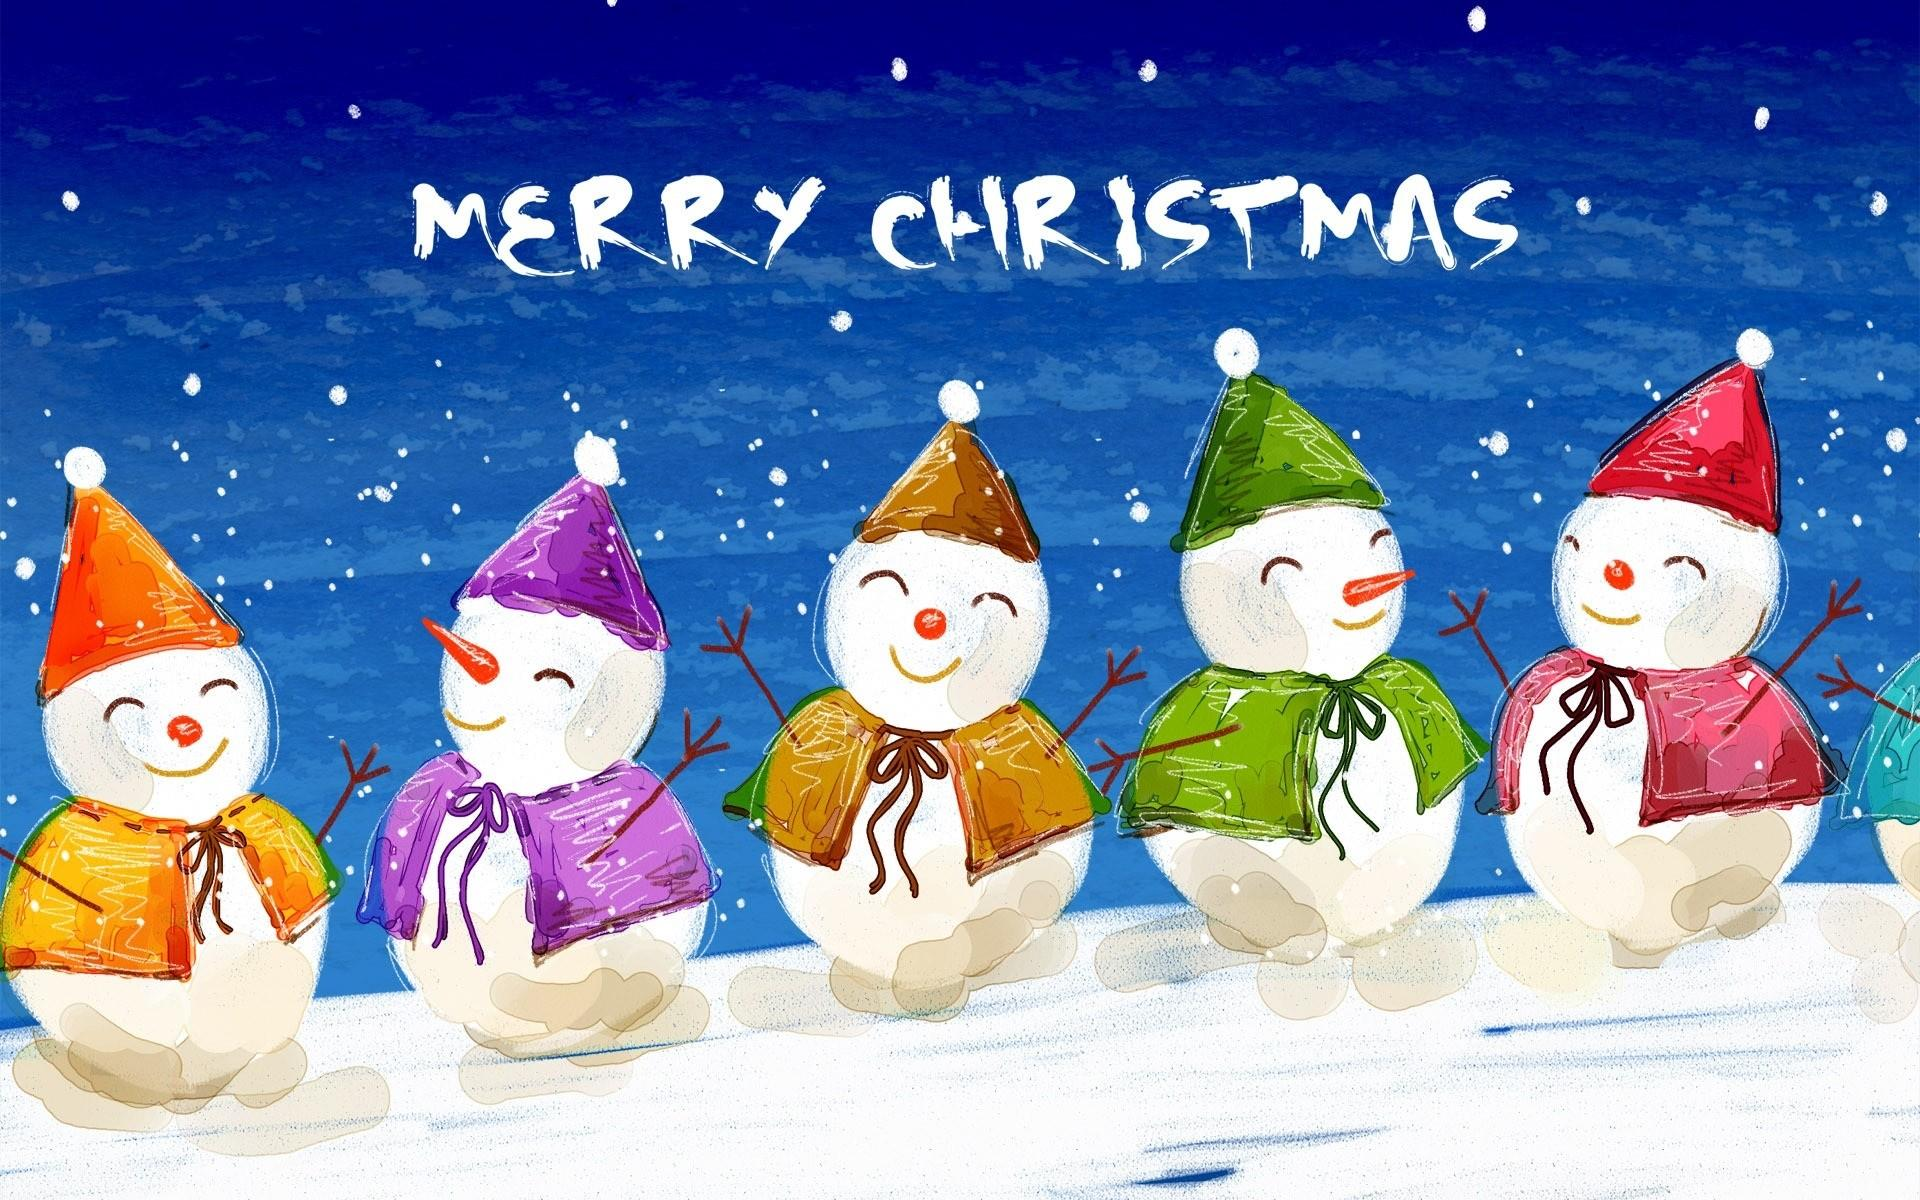 Merry Christmas Cartoon Wallpapers Wallpaper Cave